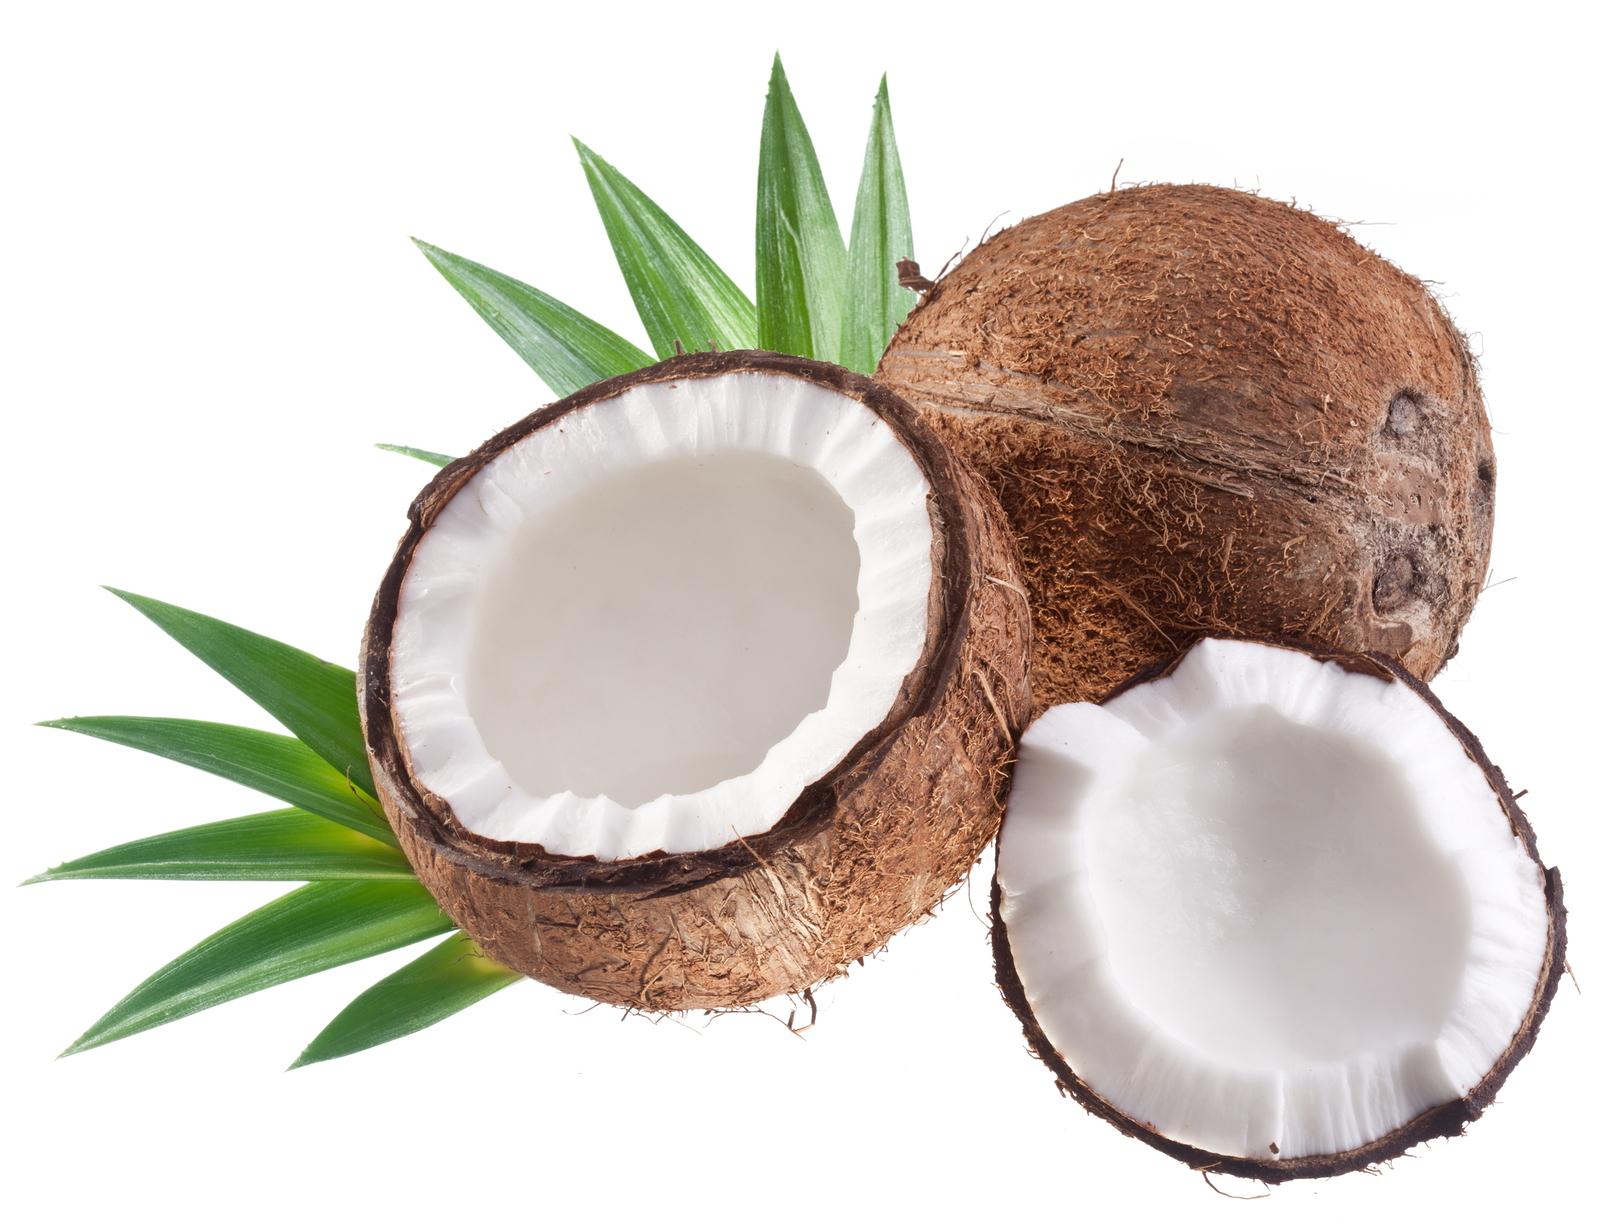 bigstock-High-quality-photos-of-coconut-12411605.jpg